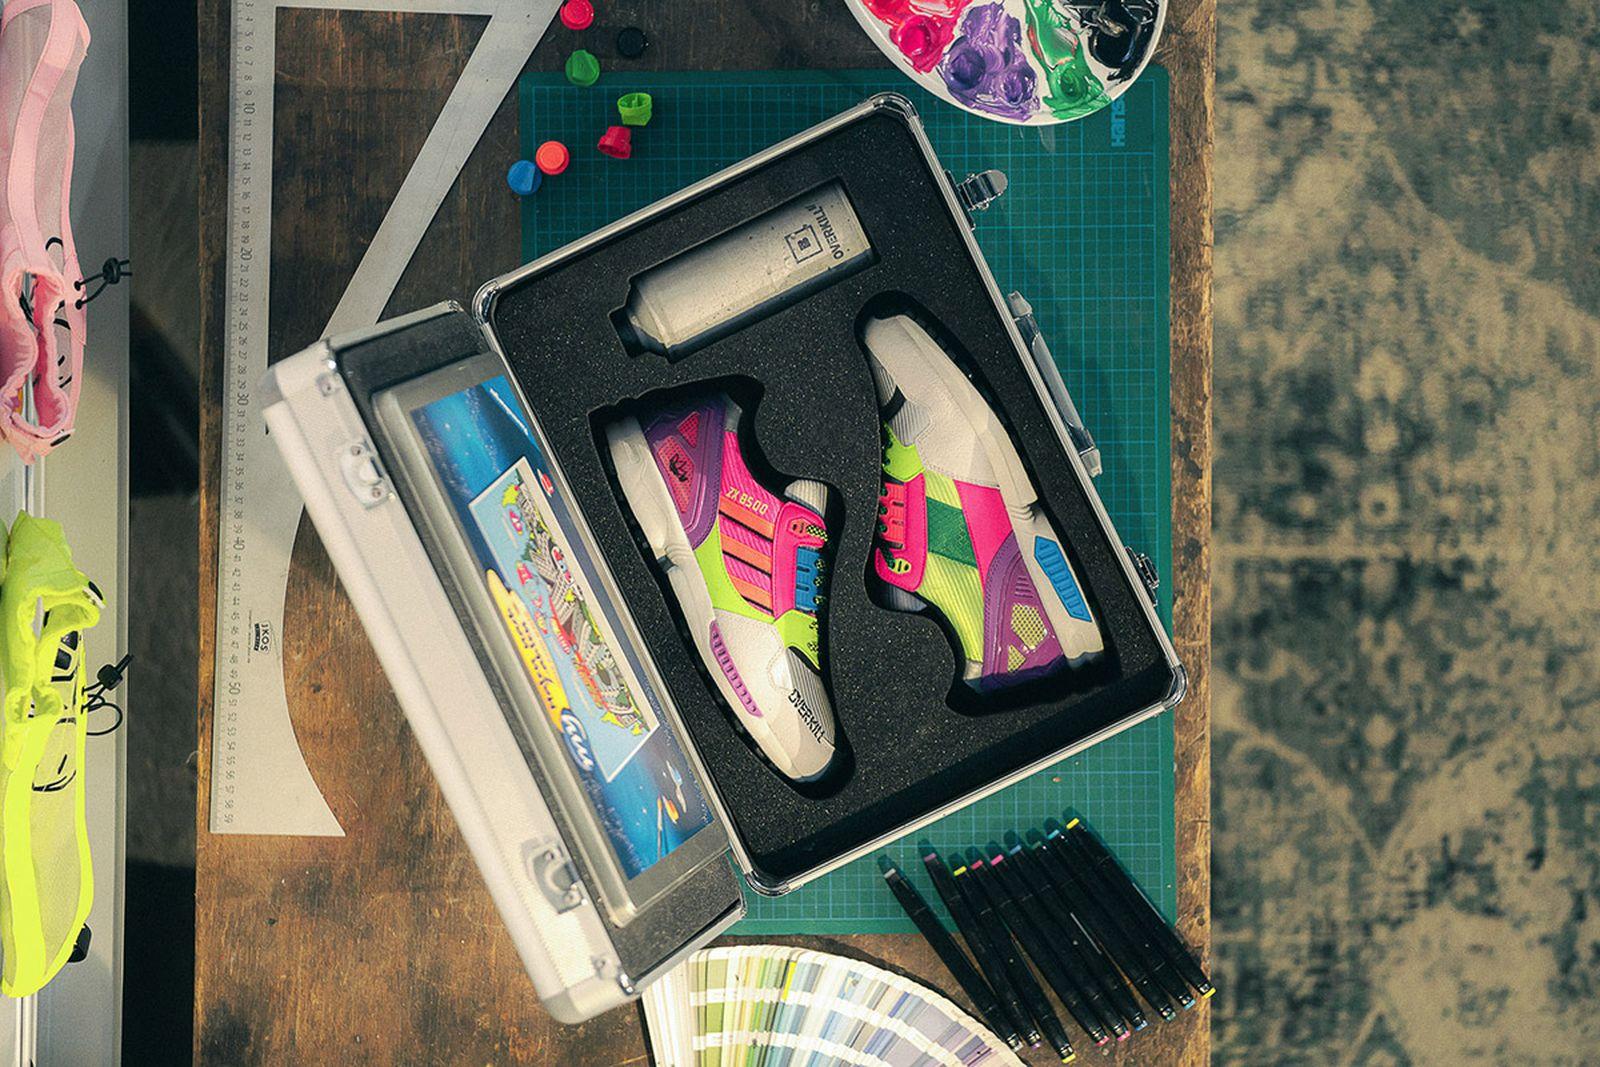 overkill-adidas-originals-zx8500-release-date-price-013